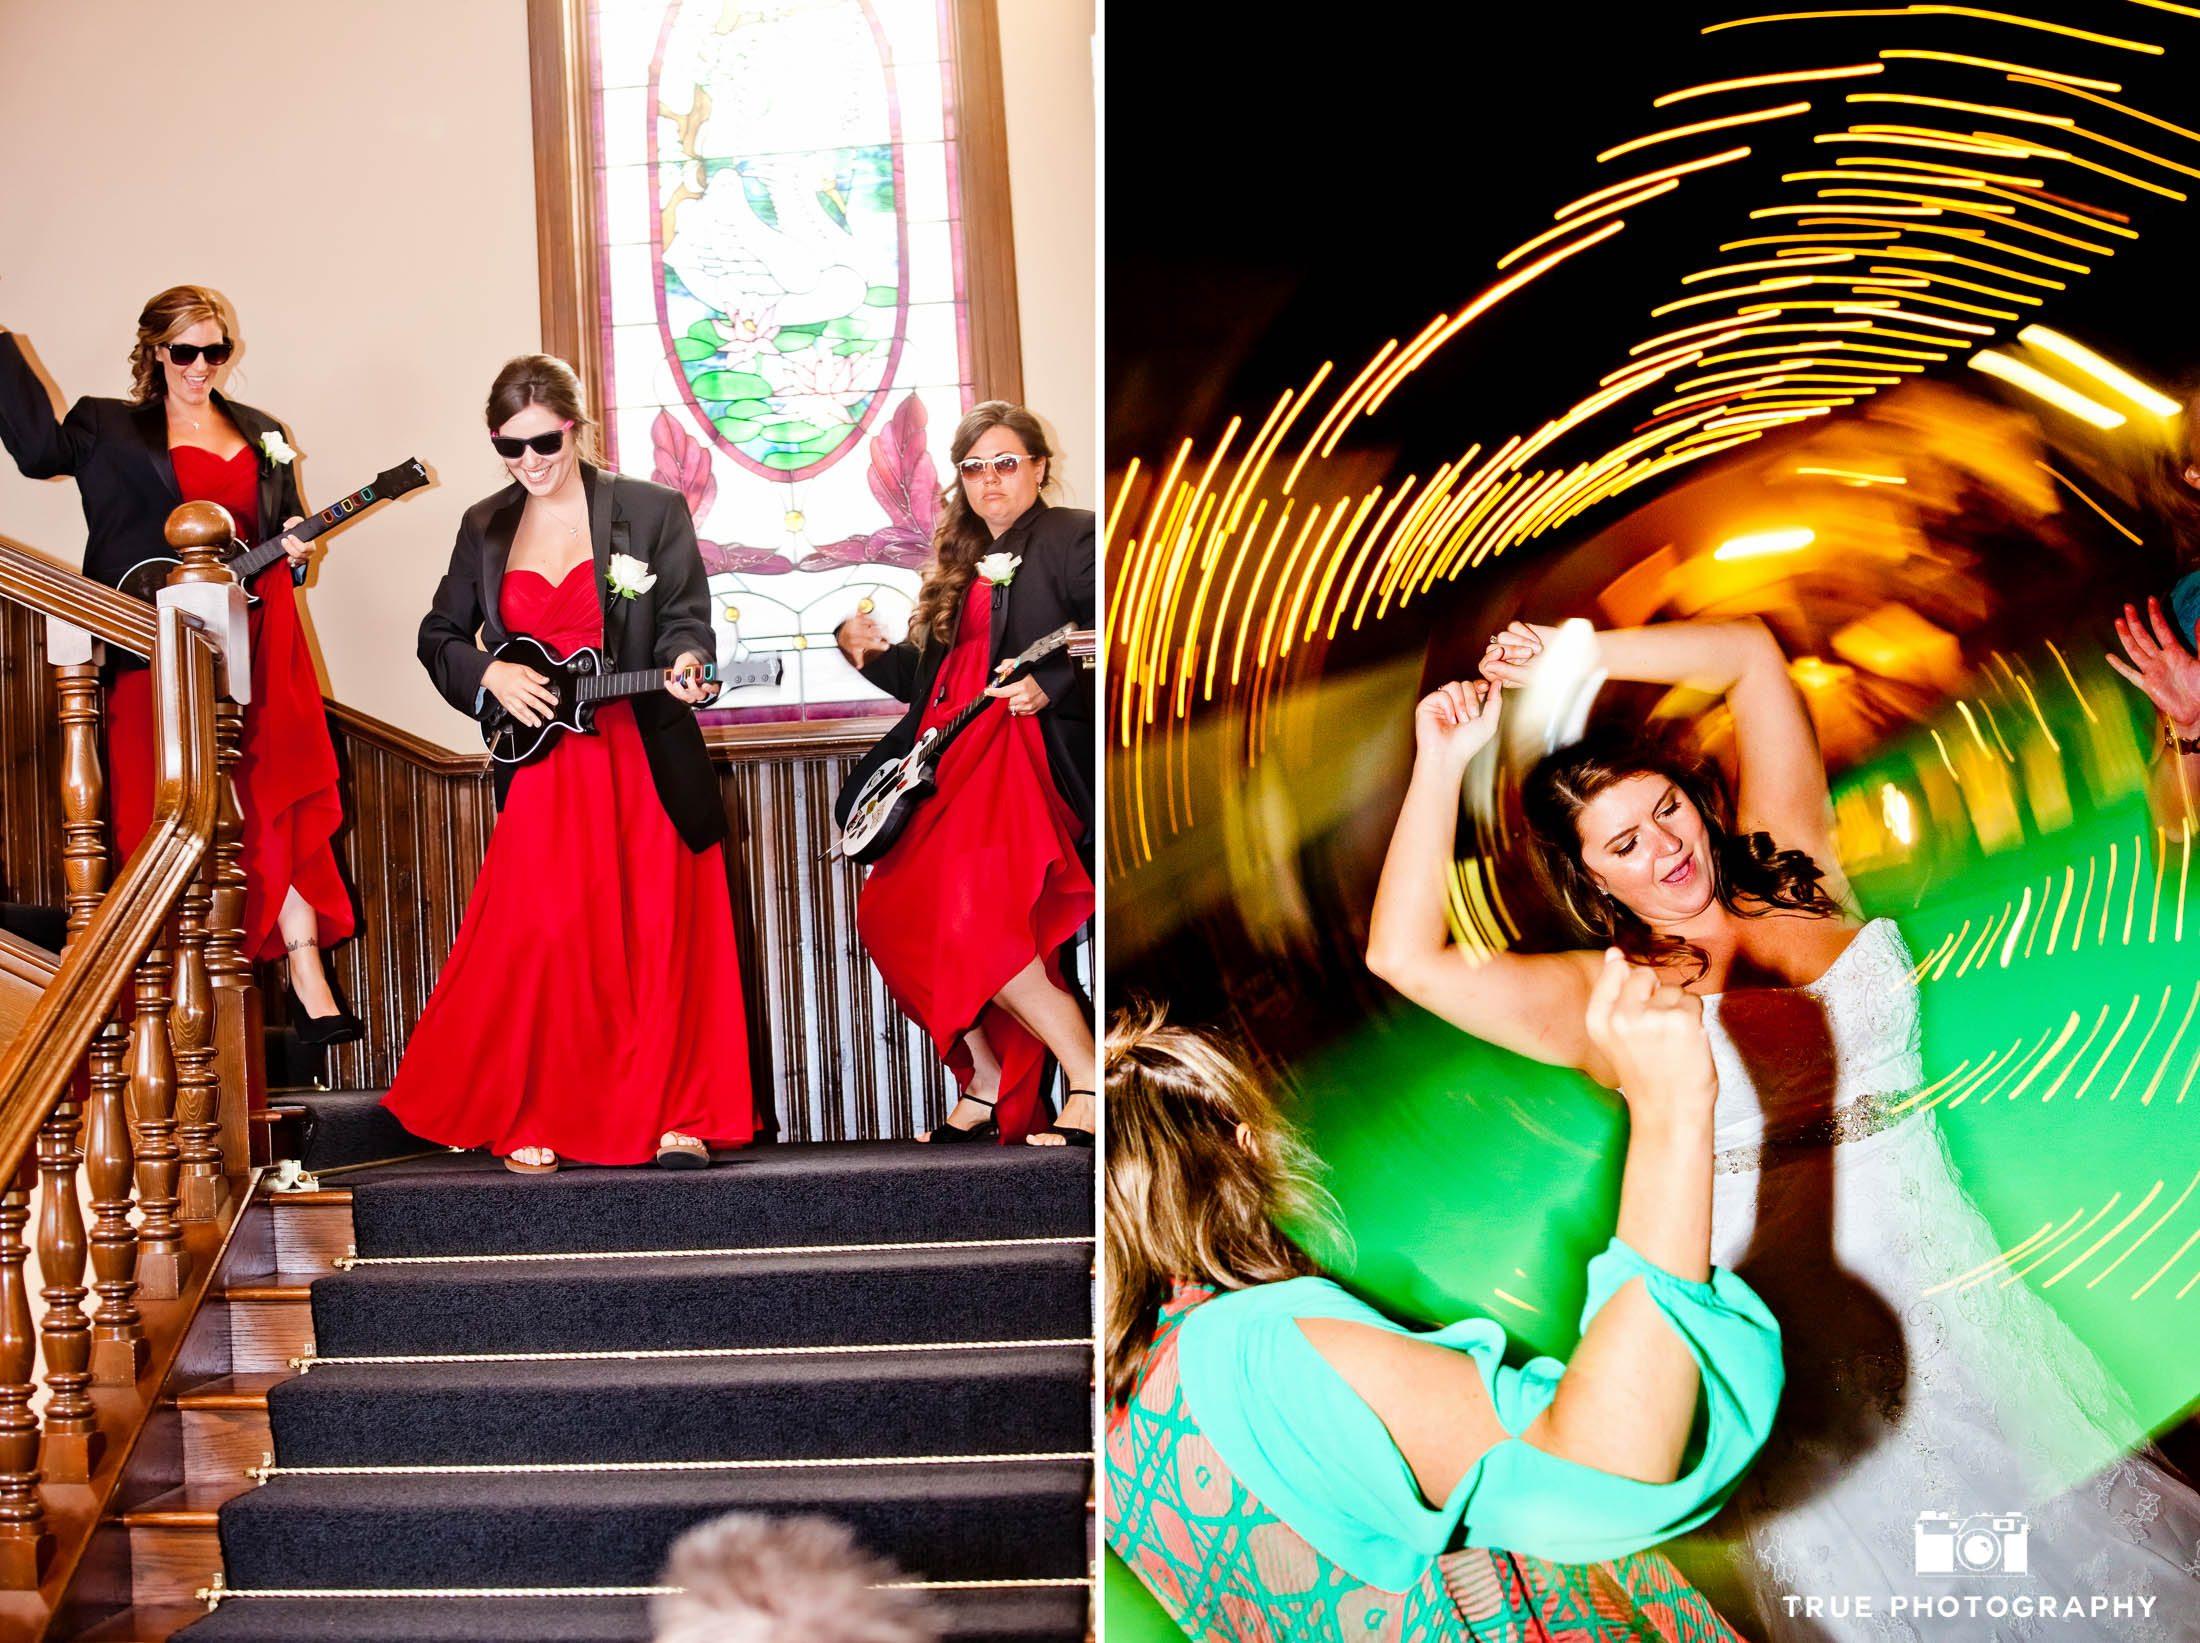 Bridesmaids make fun grand entrance and dance during wedding reception